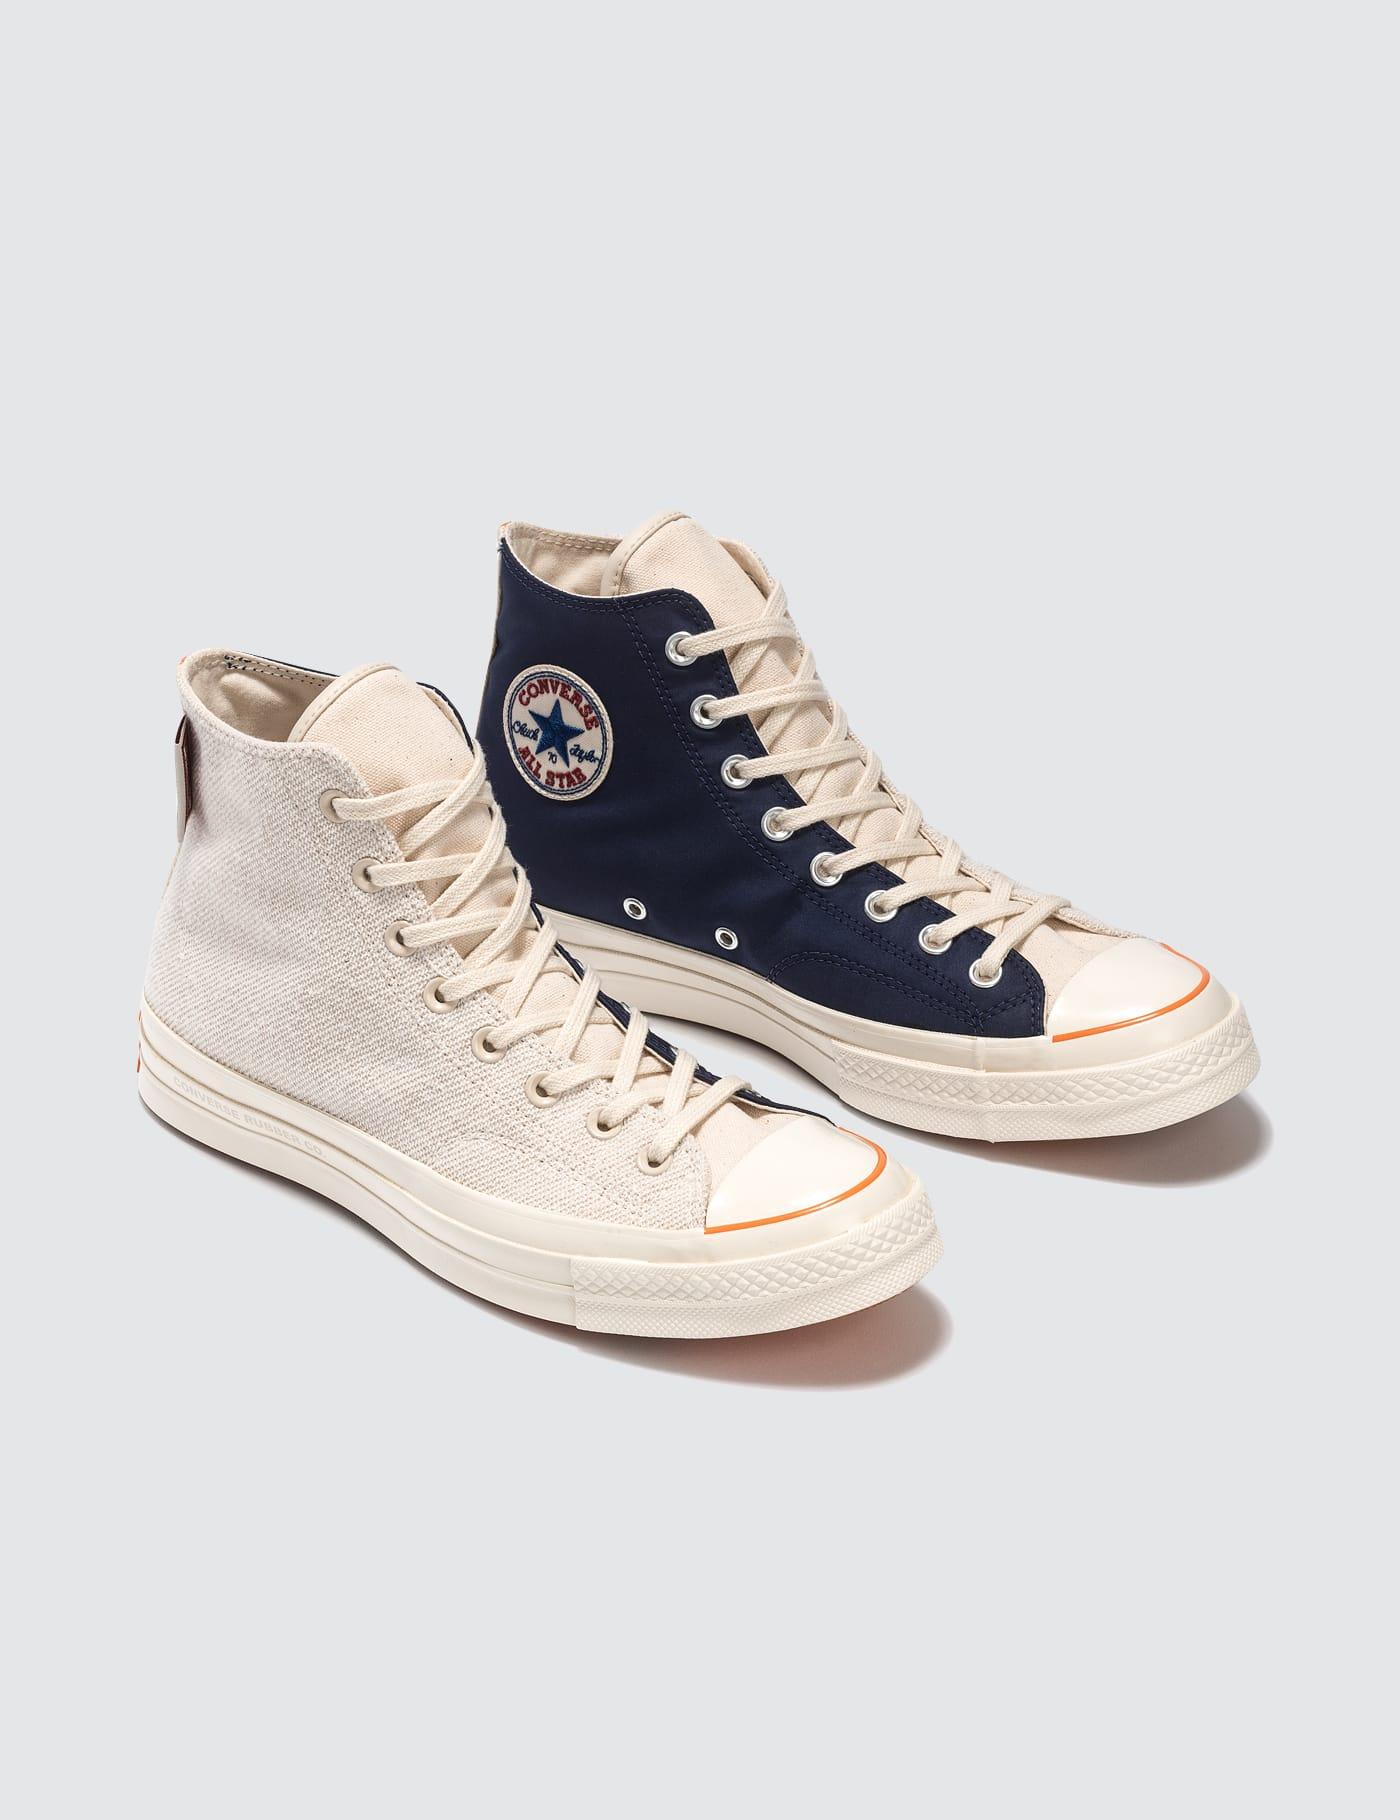 Converse x Footpatrol Chuck 70 Hi